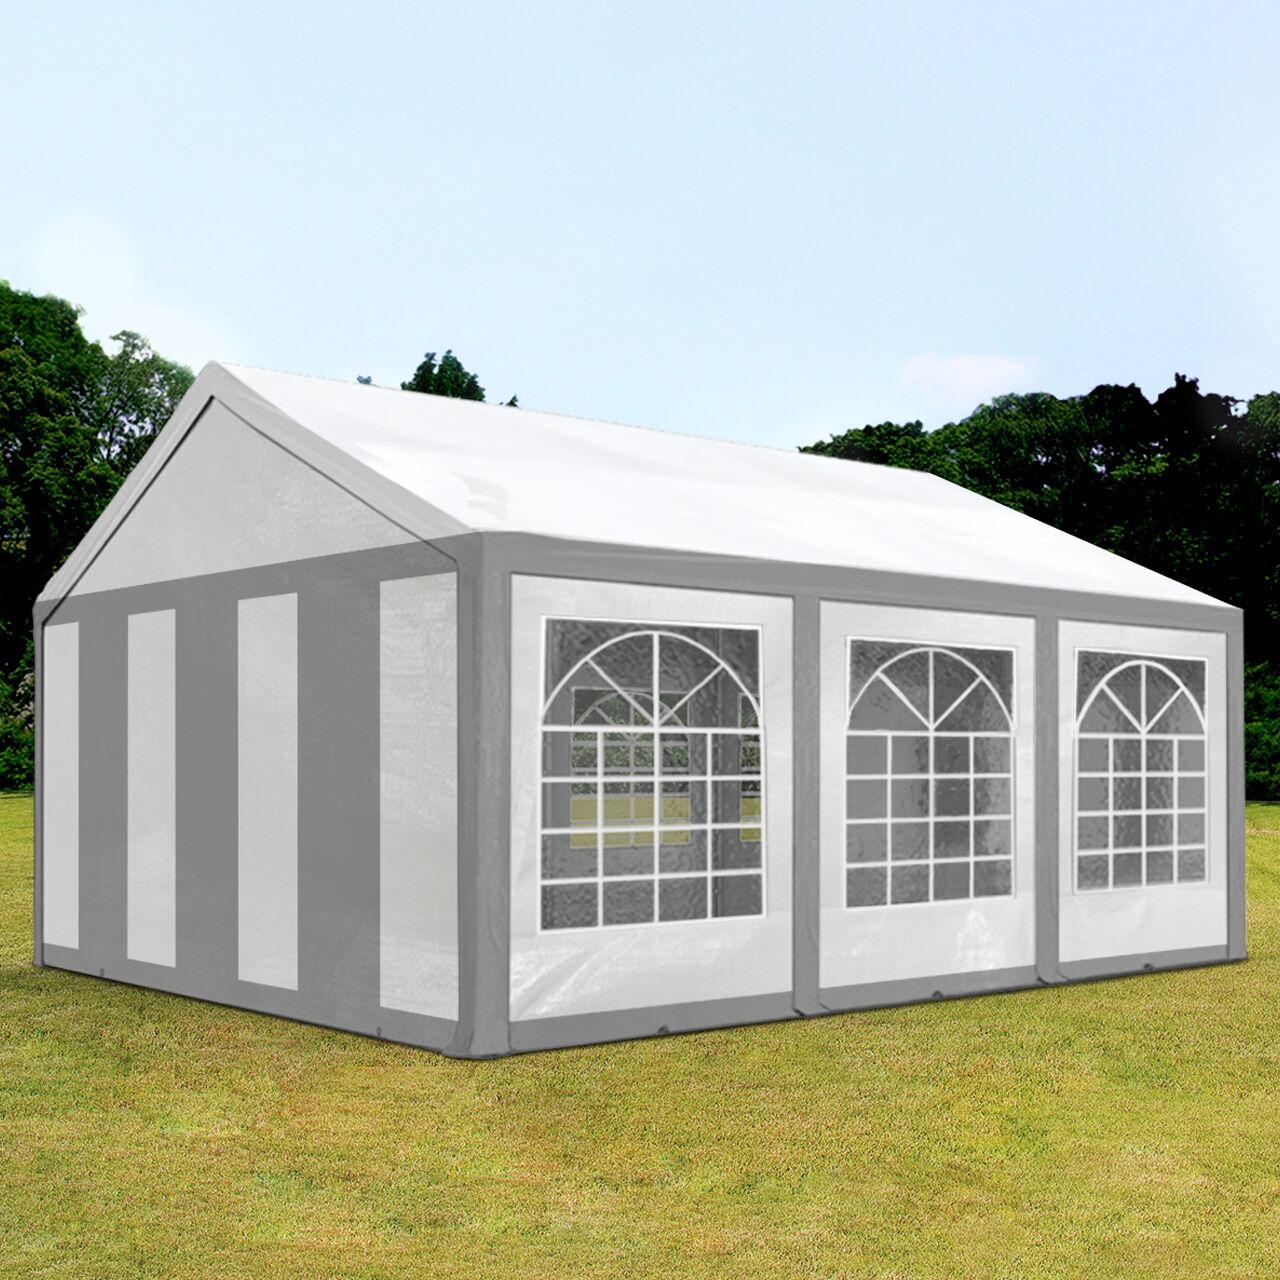 Toolport Tendone per Feste 3x6m PE 240g/m² bianco impermeabile